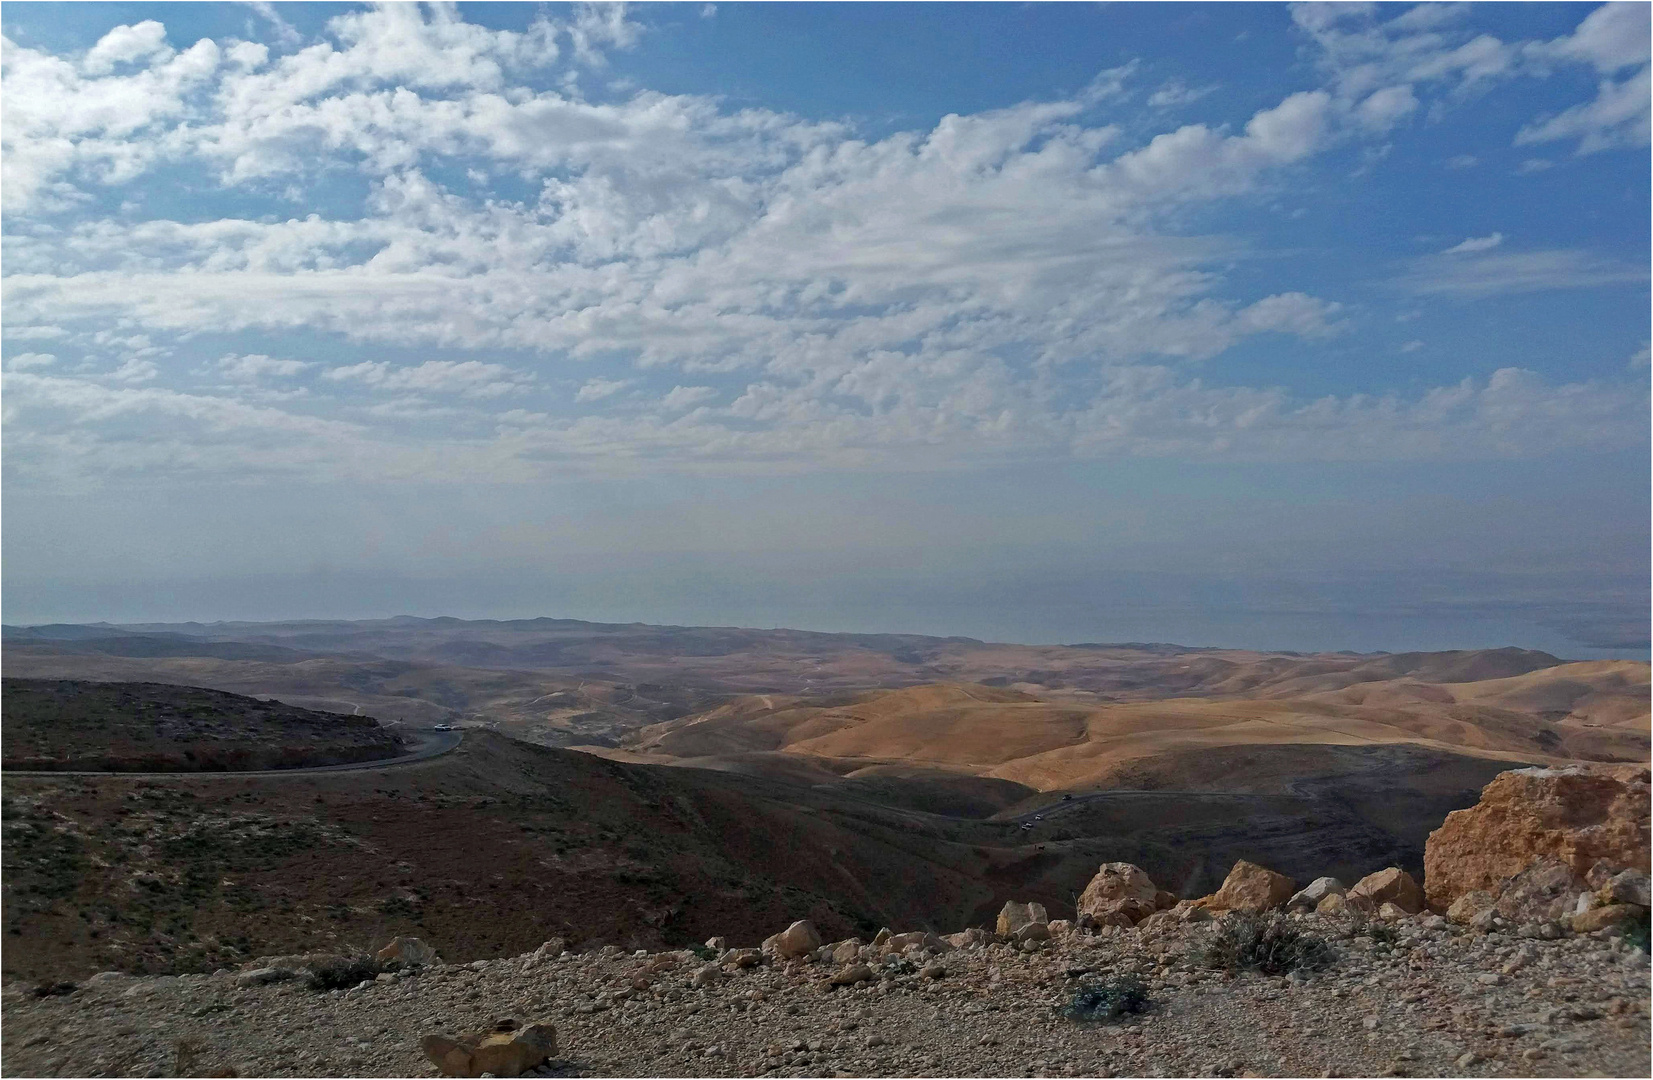 En allant vers la Mer Morte  - Jordanie